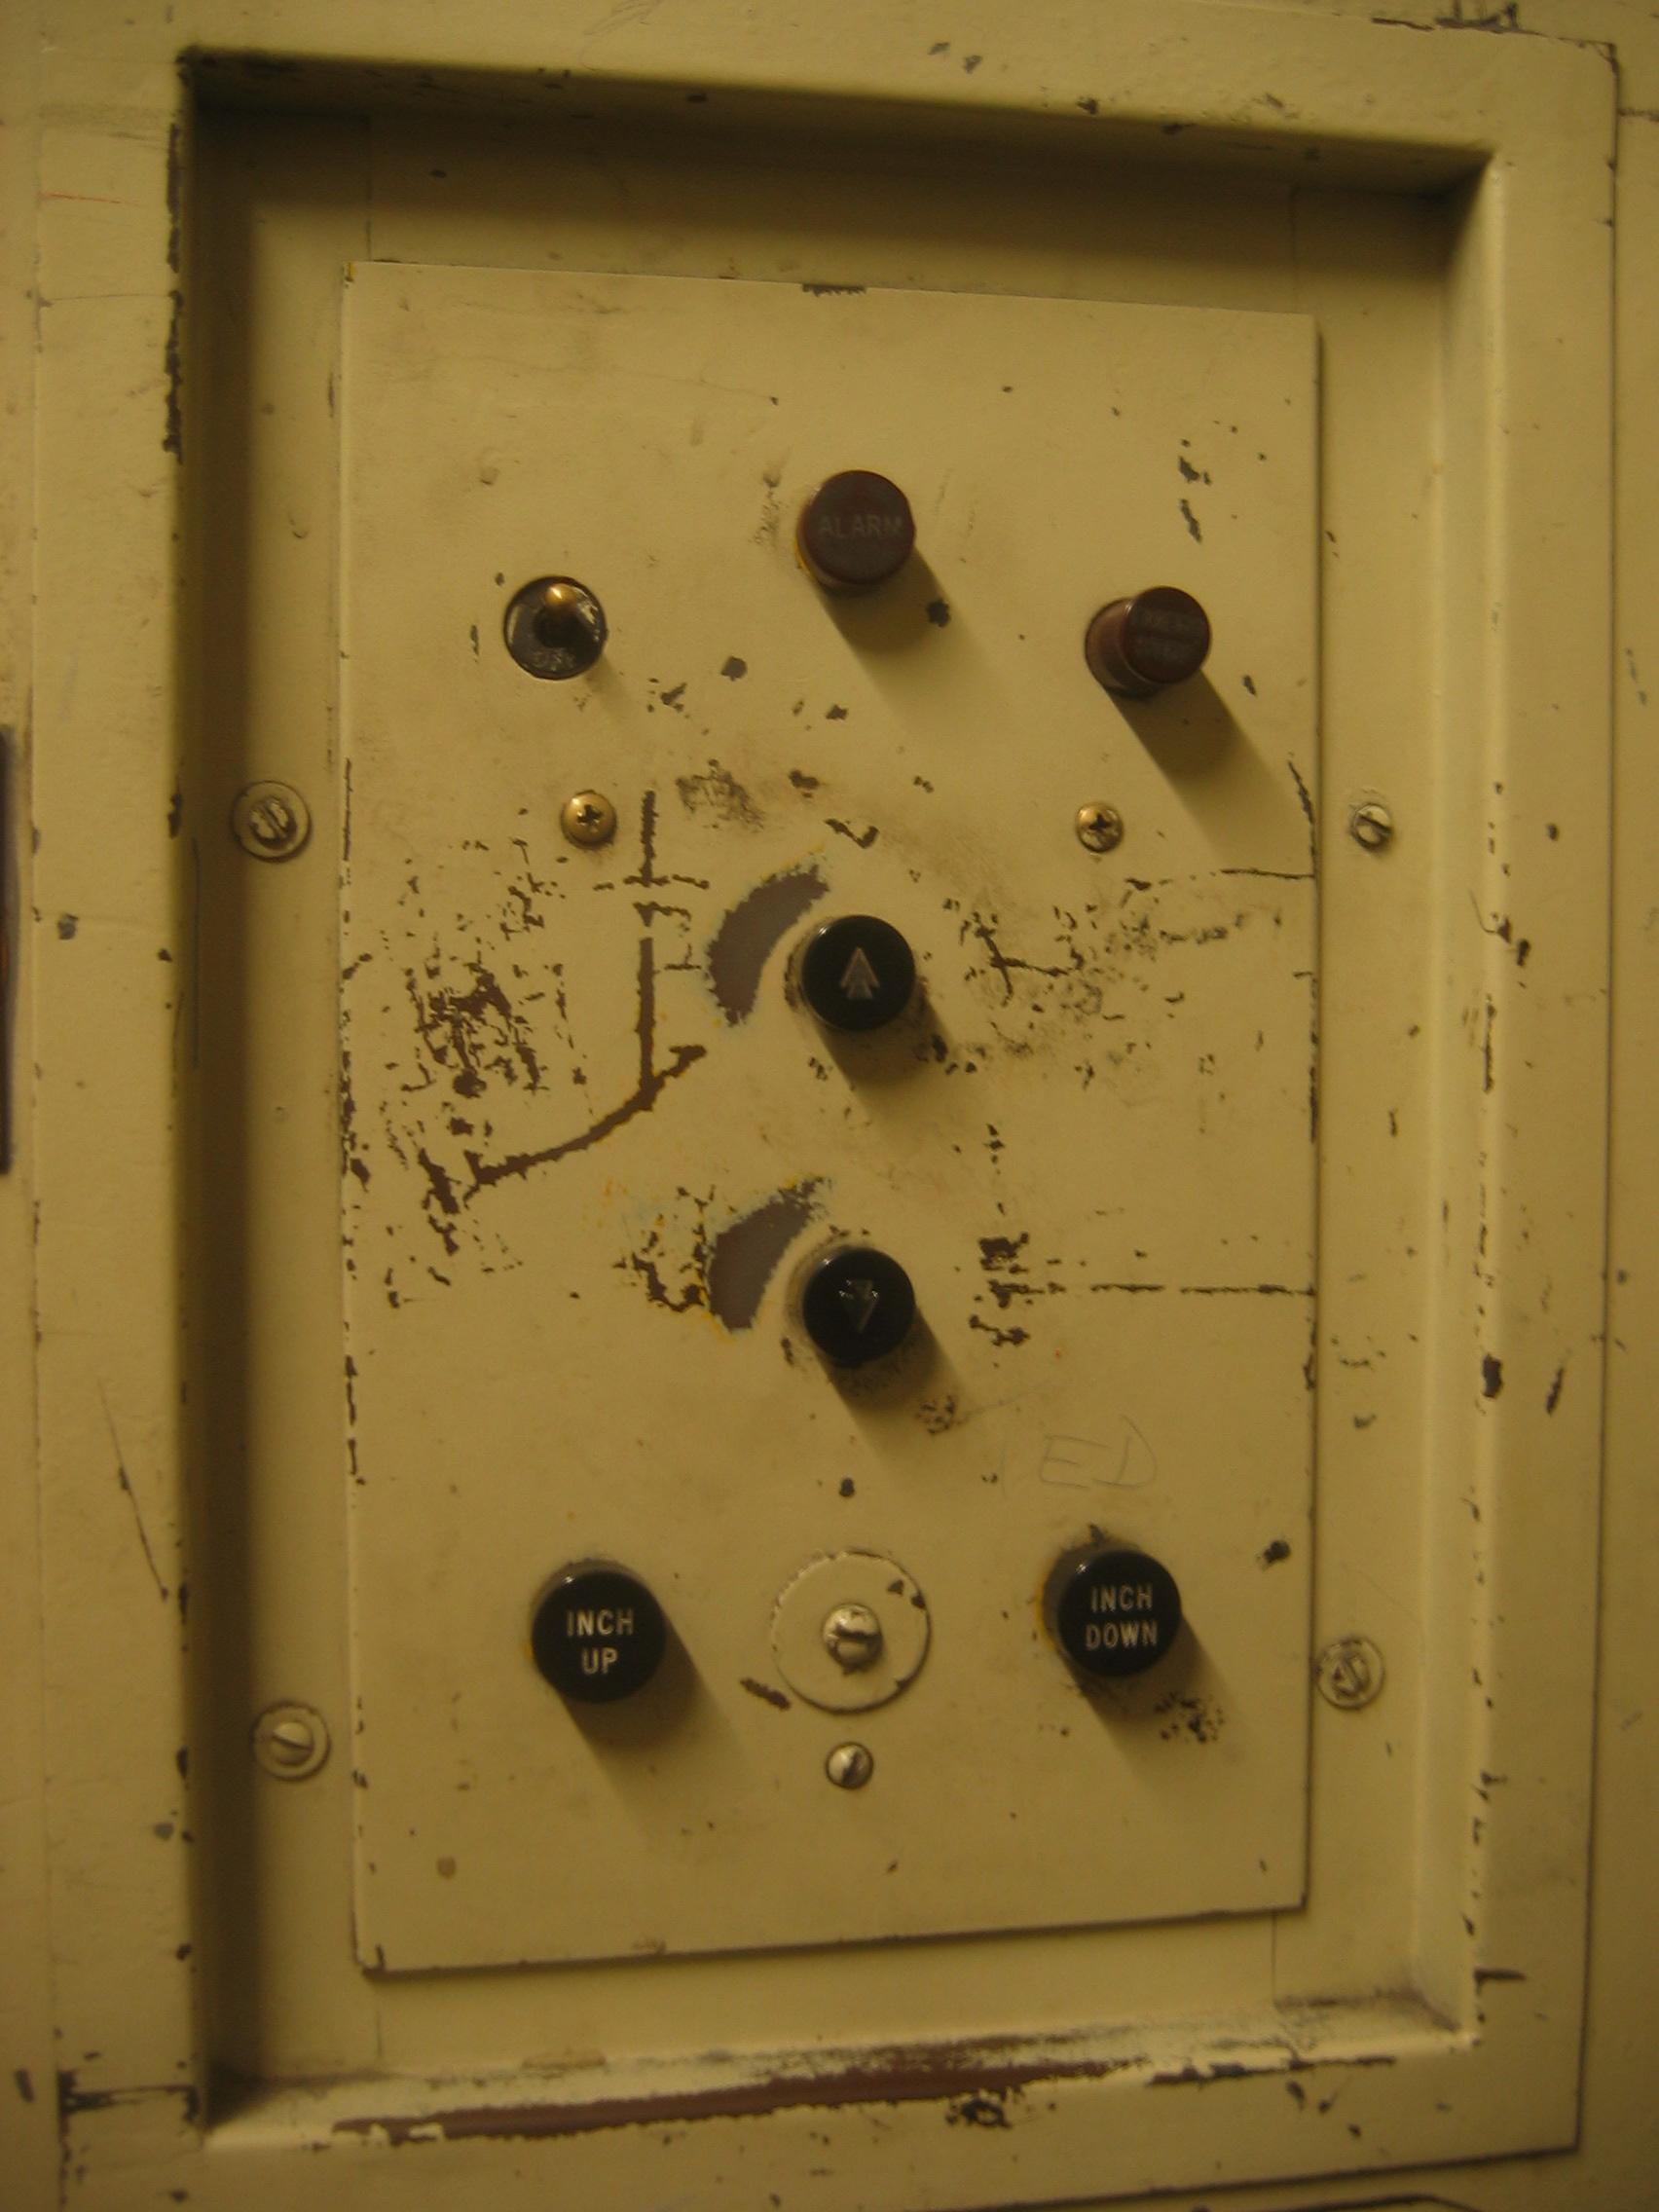 Manual Pushbutton Elevator